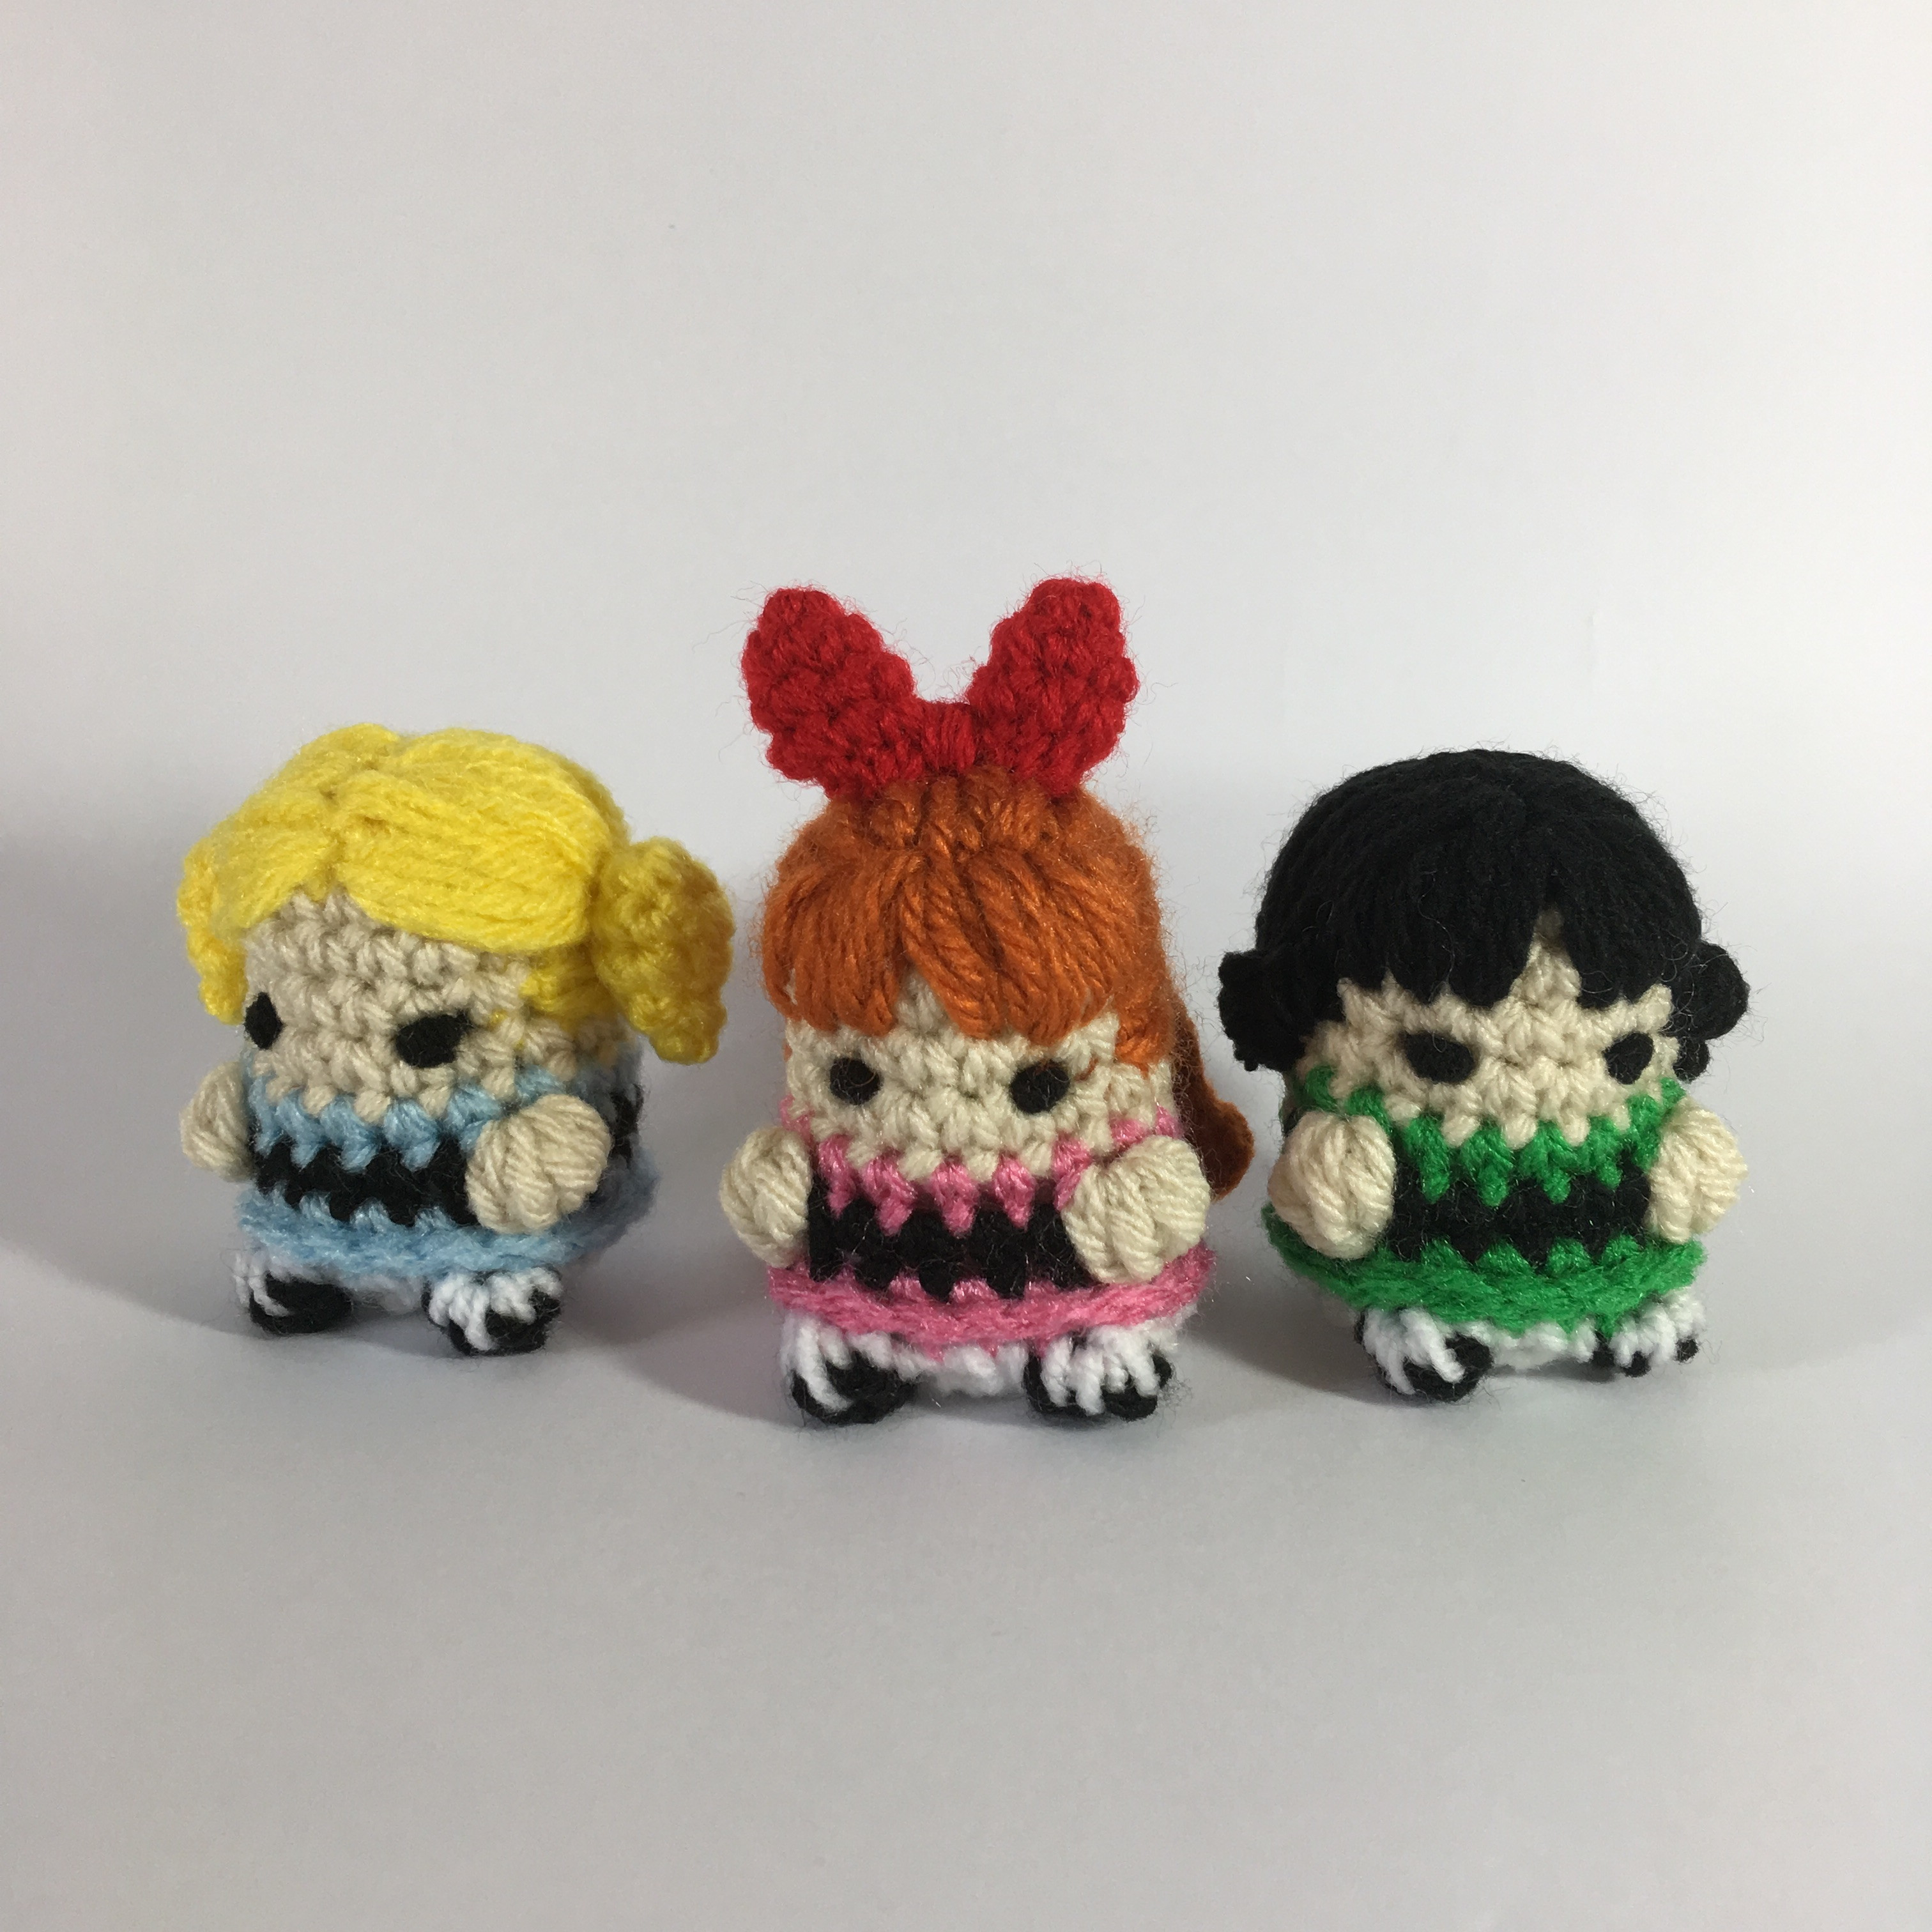 How to crochet doll amigurumi Powerpuff Girls cartoon كروشيه دميه ... | 3024x3024